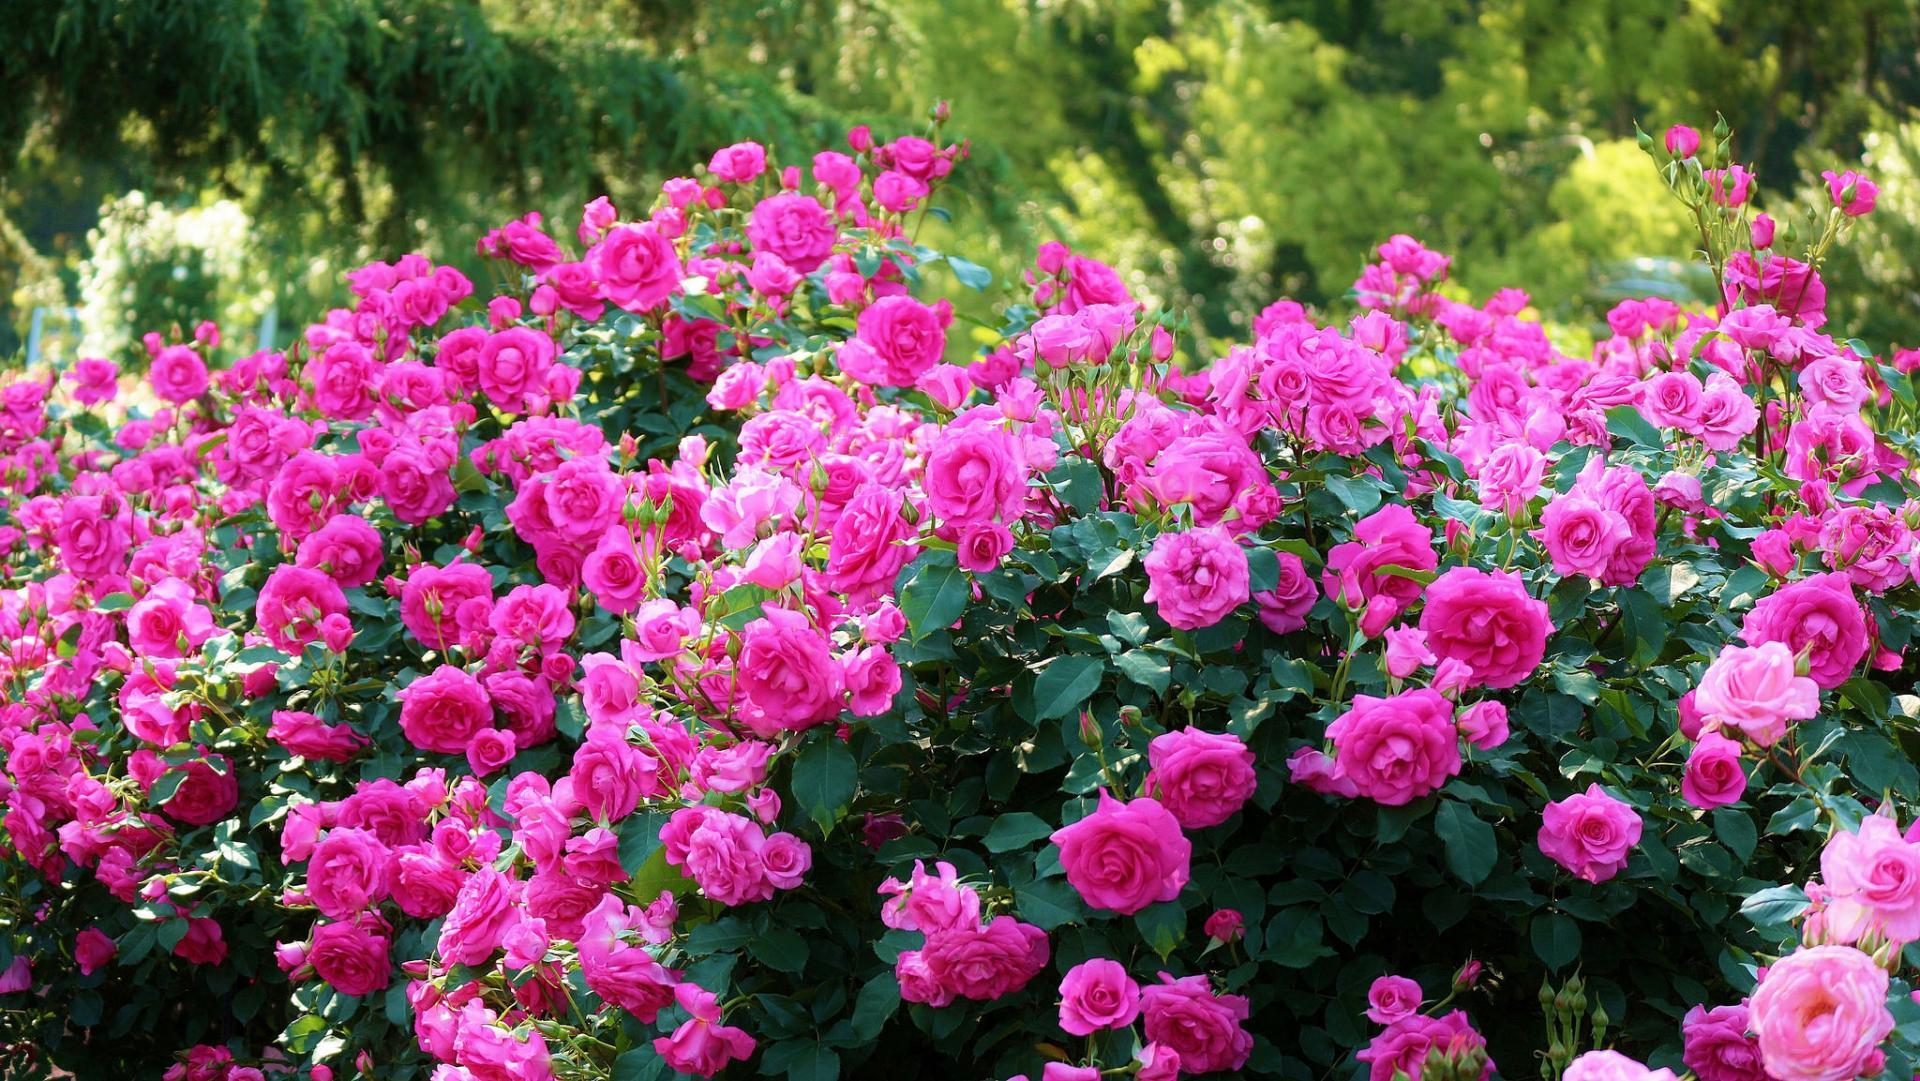 Rose Bush Wallpaper Hd Download